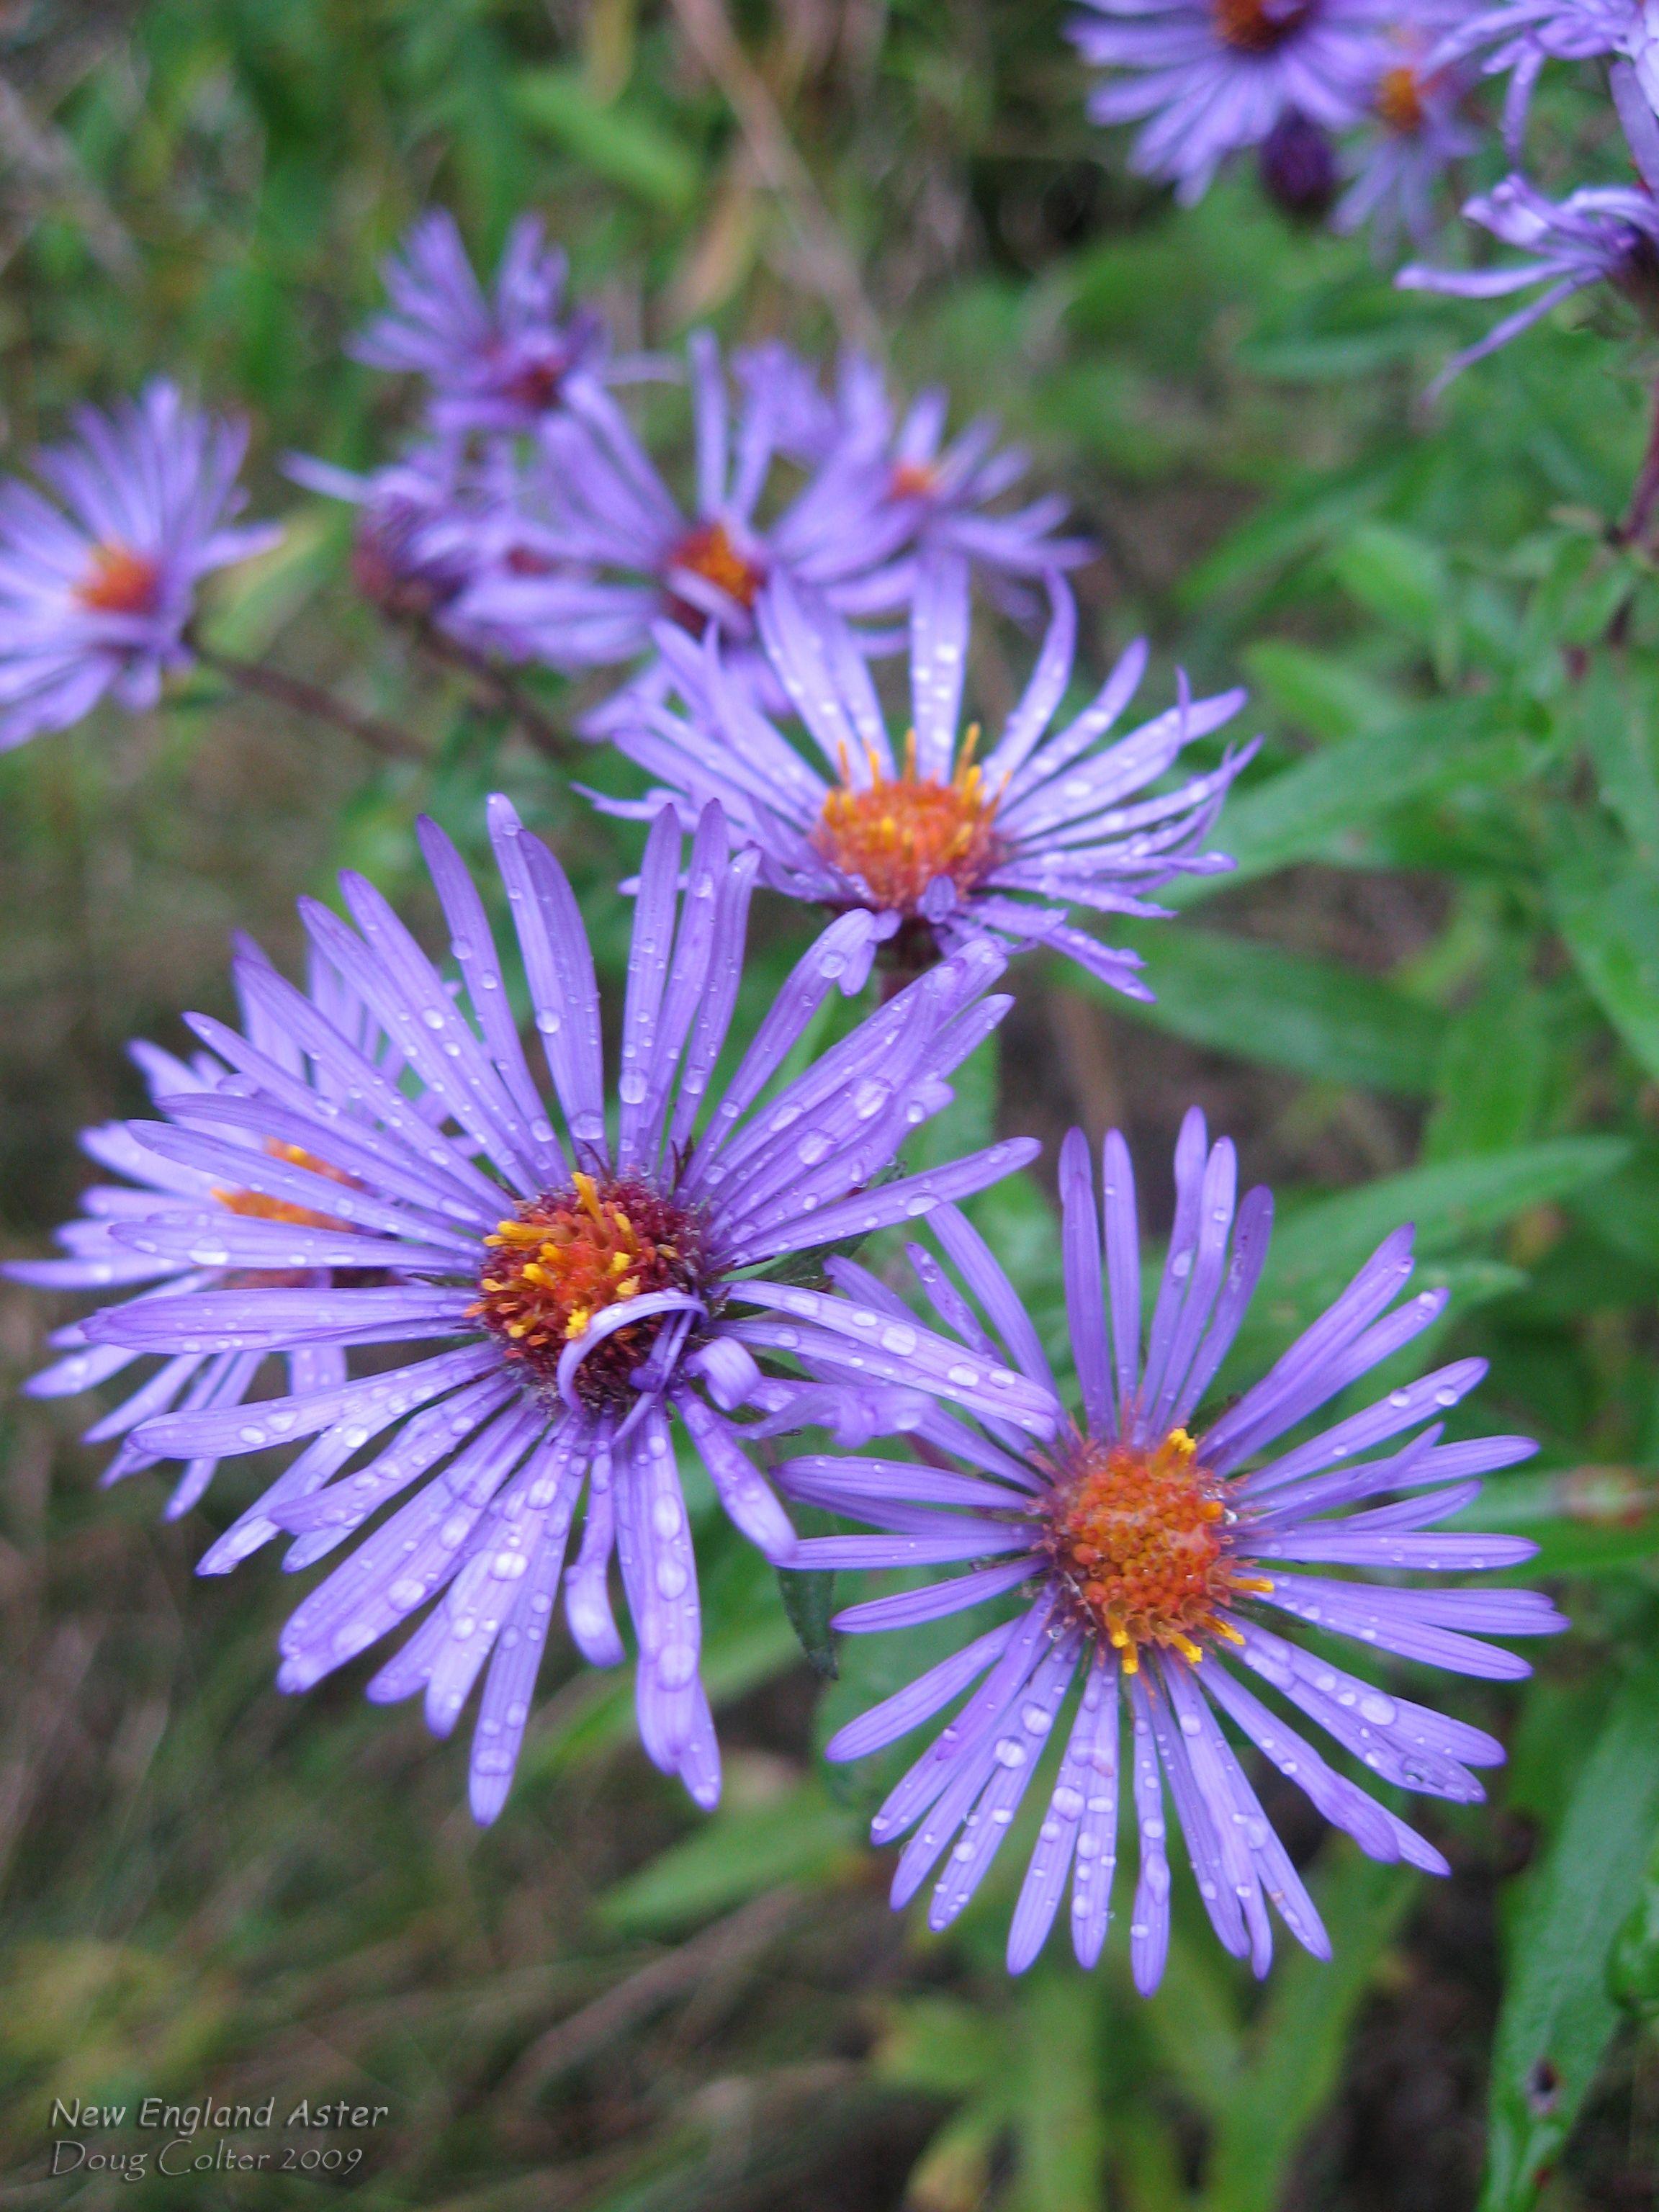 New England Aster (Aster novaeangliae) • Family Aster